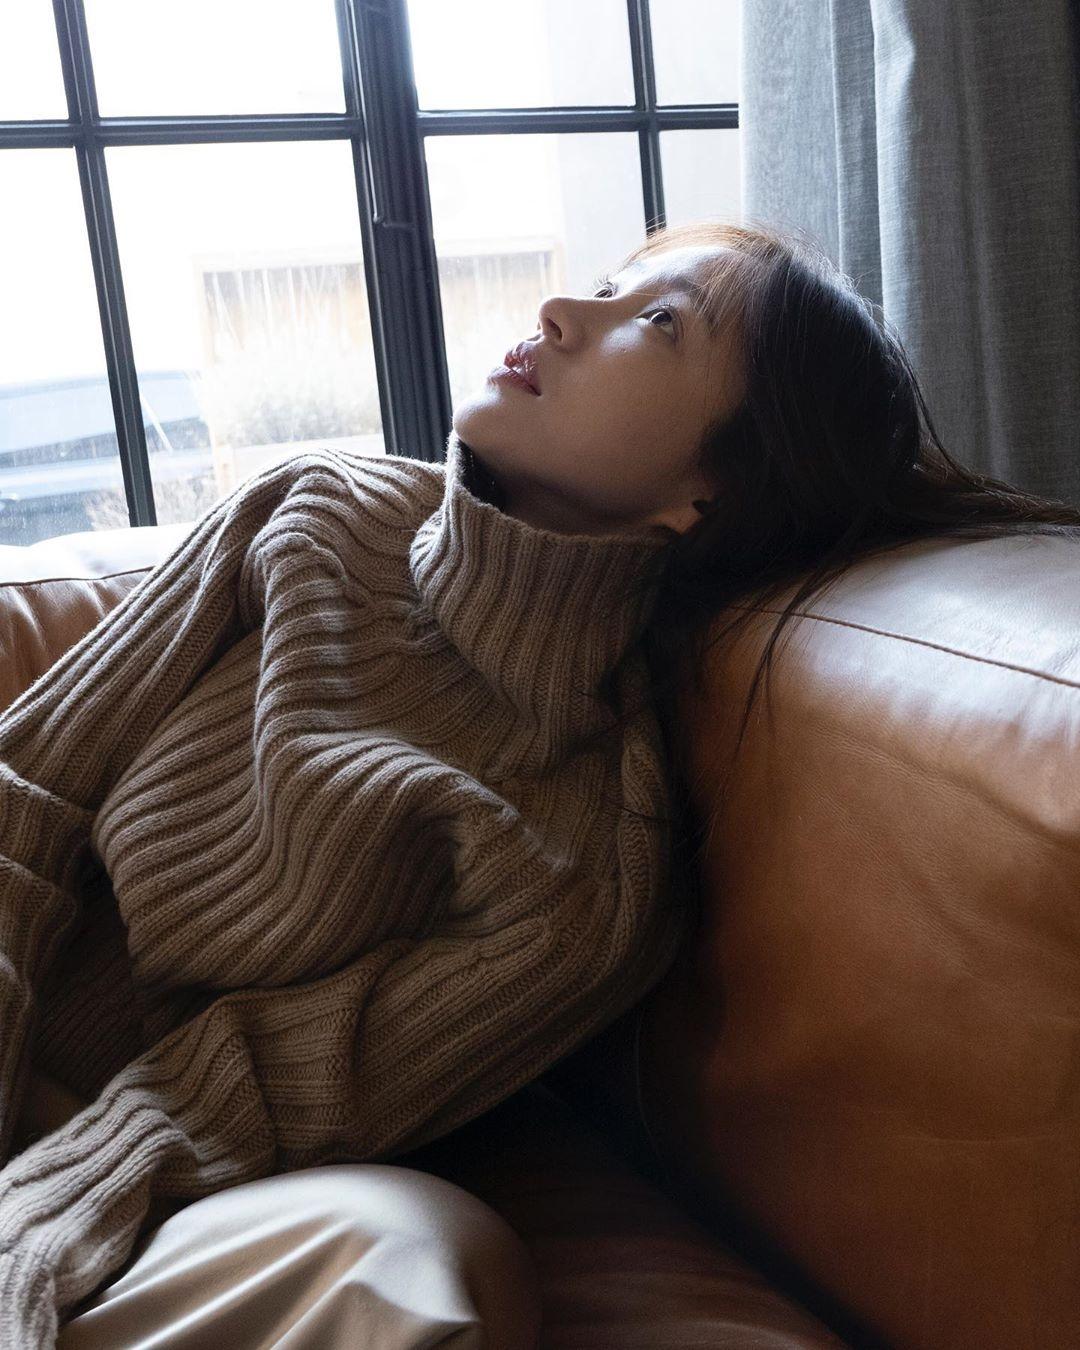 EXID安喜延网络剧《XX》即将播完 公开依依不舍的近况照片